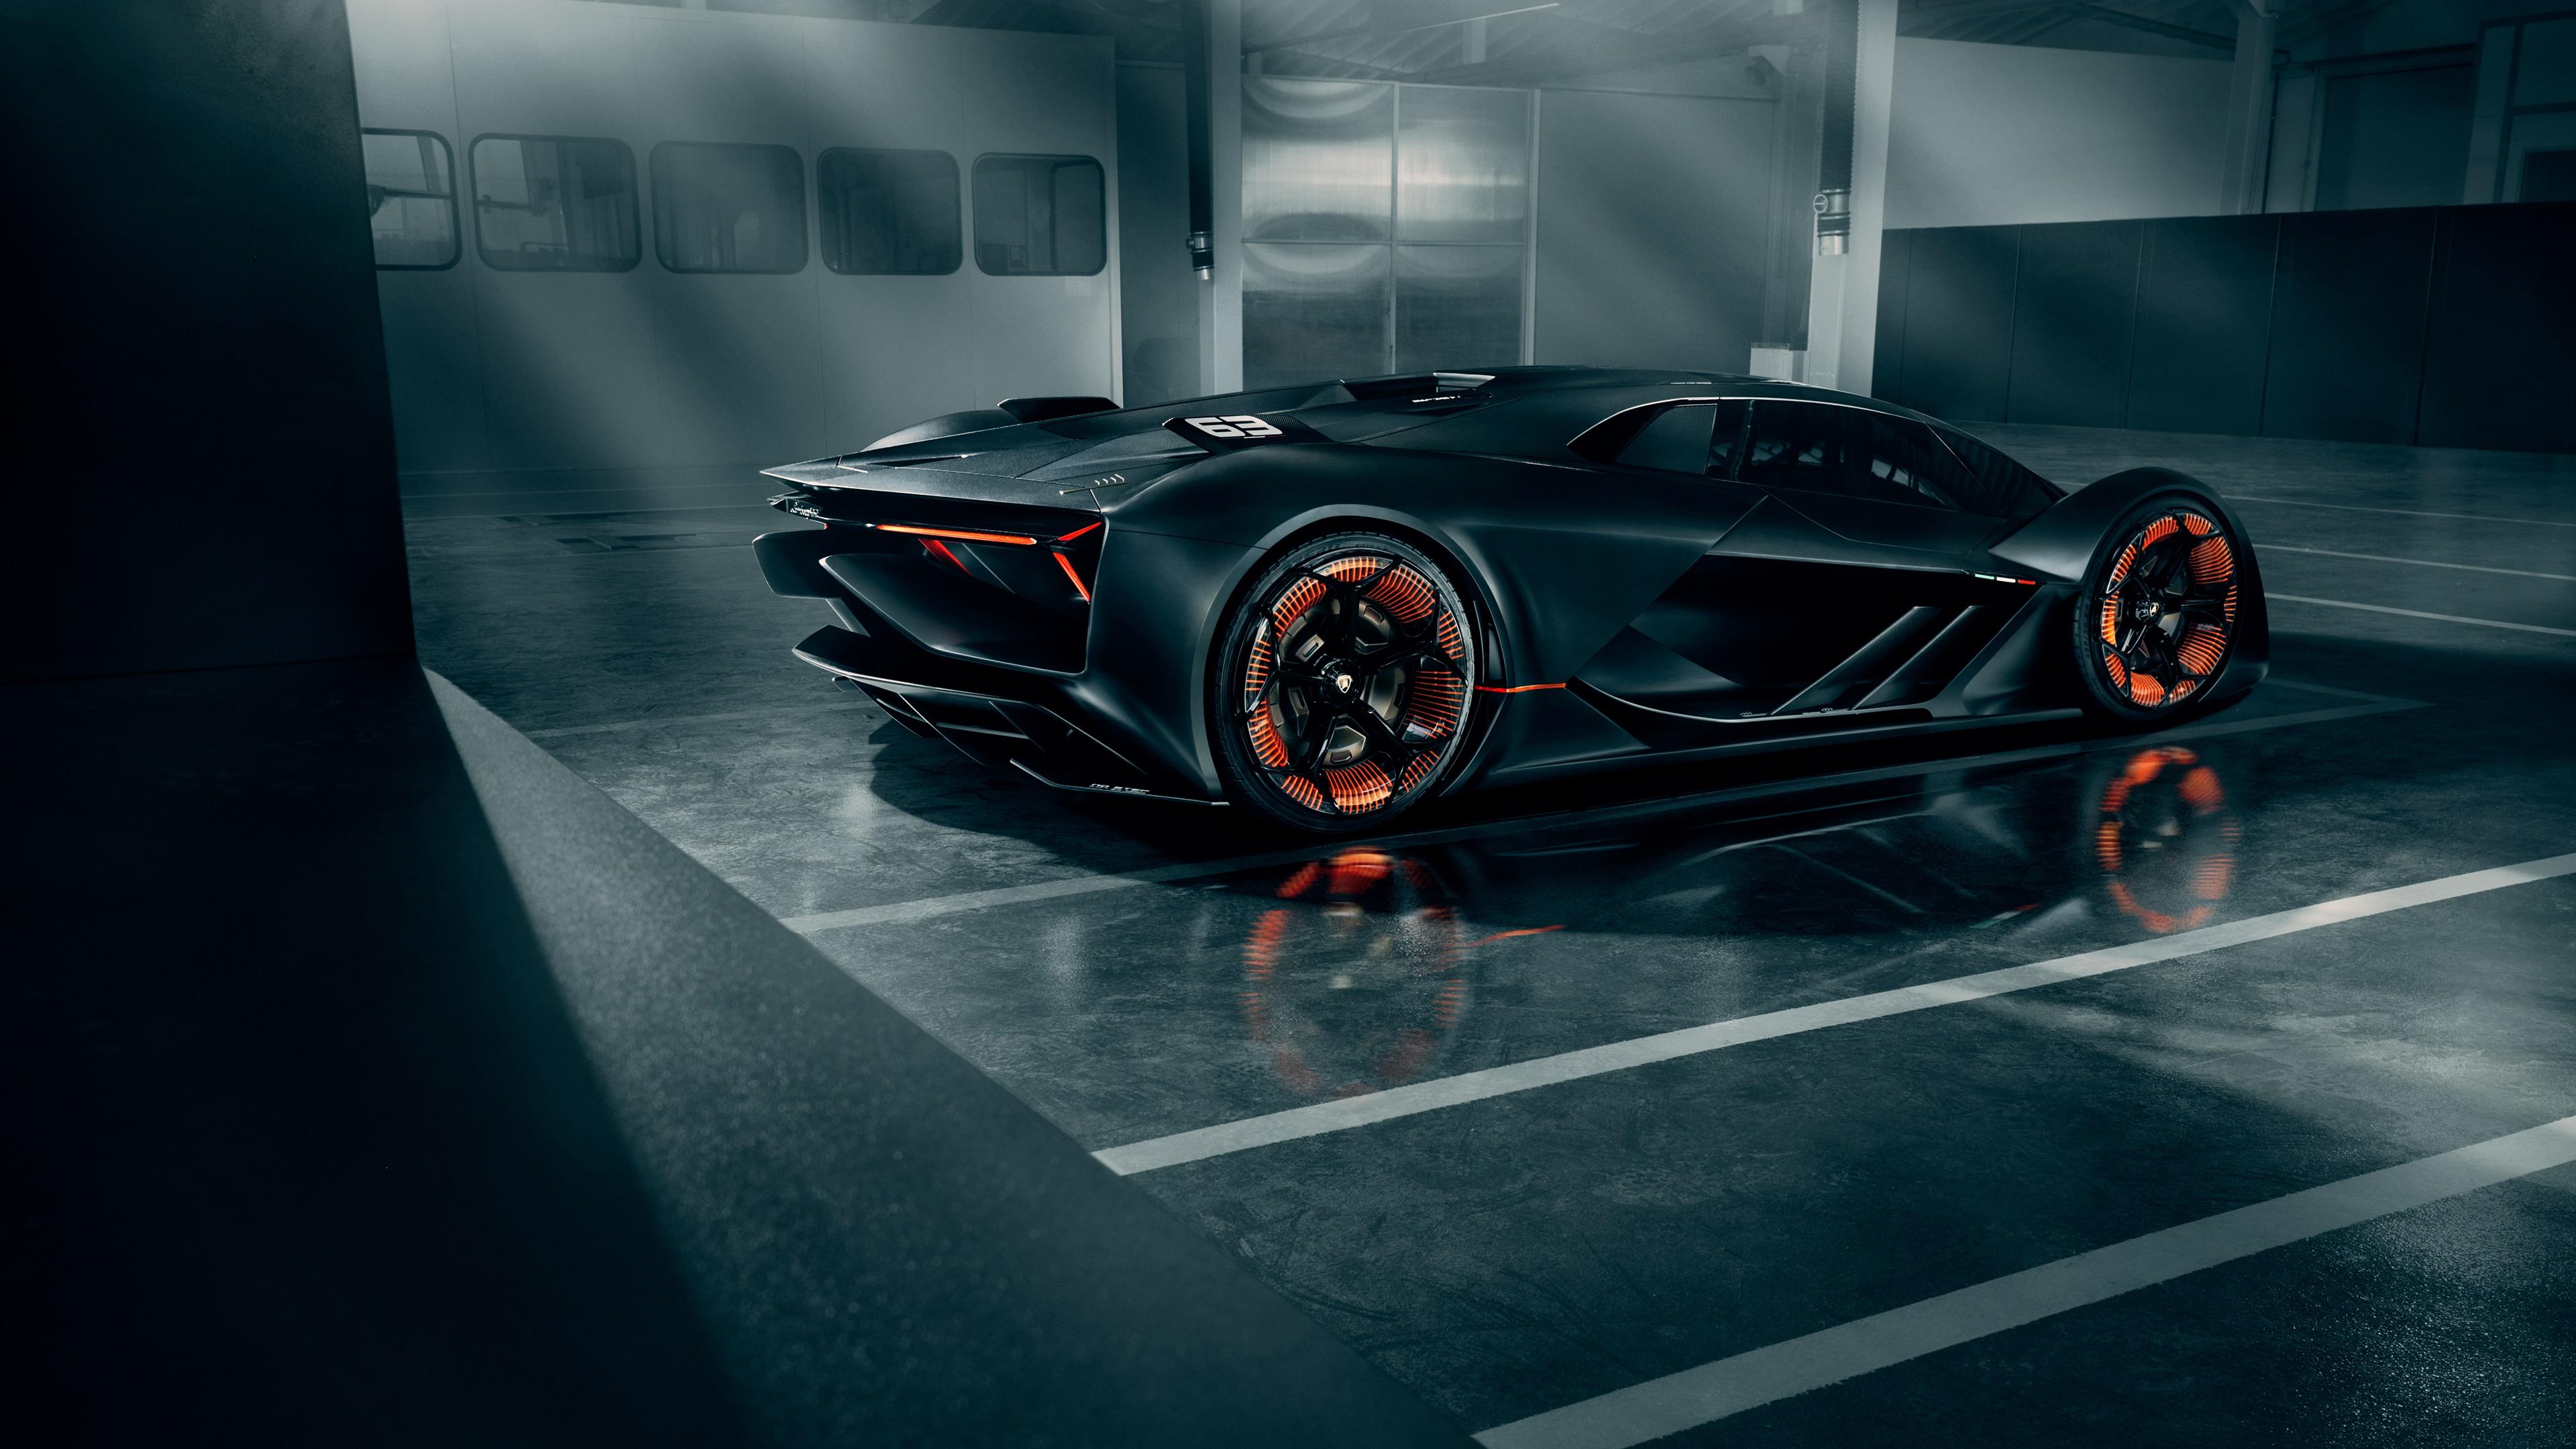 Lamborghini Terzo Millennio 4k Ultrahd Wallpaper Backiee Free